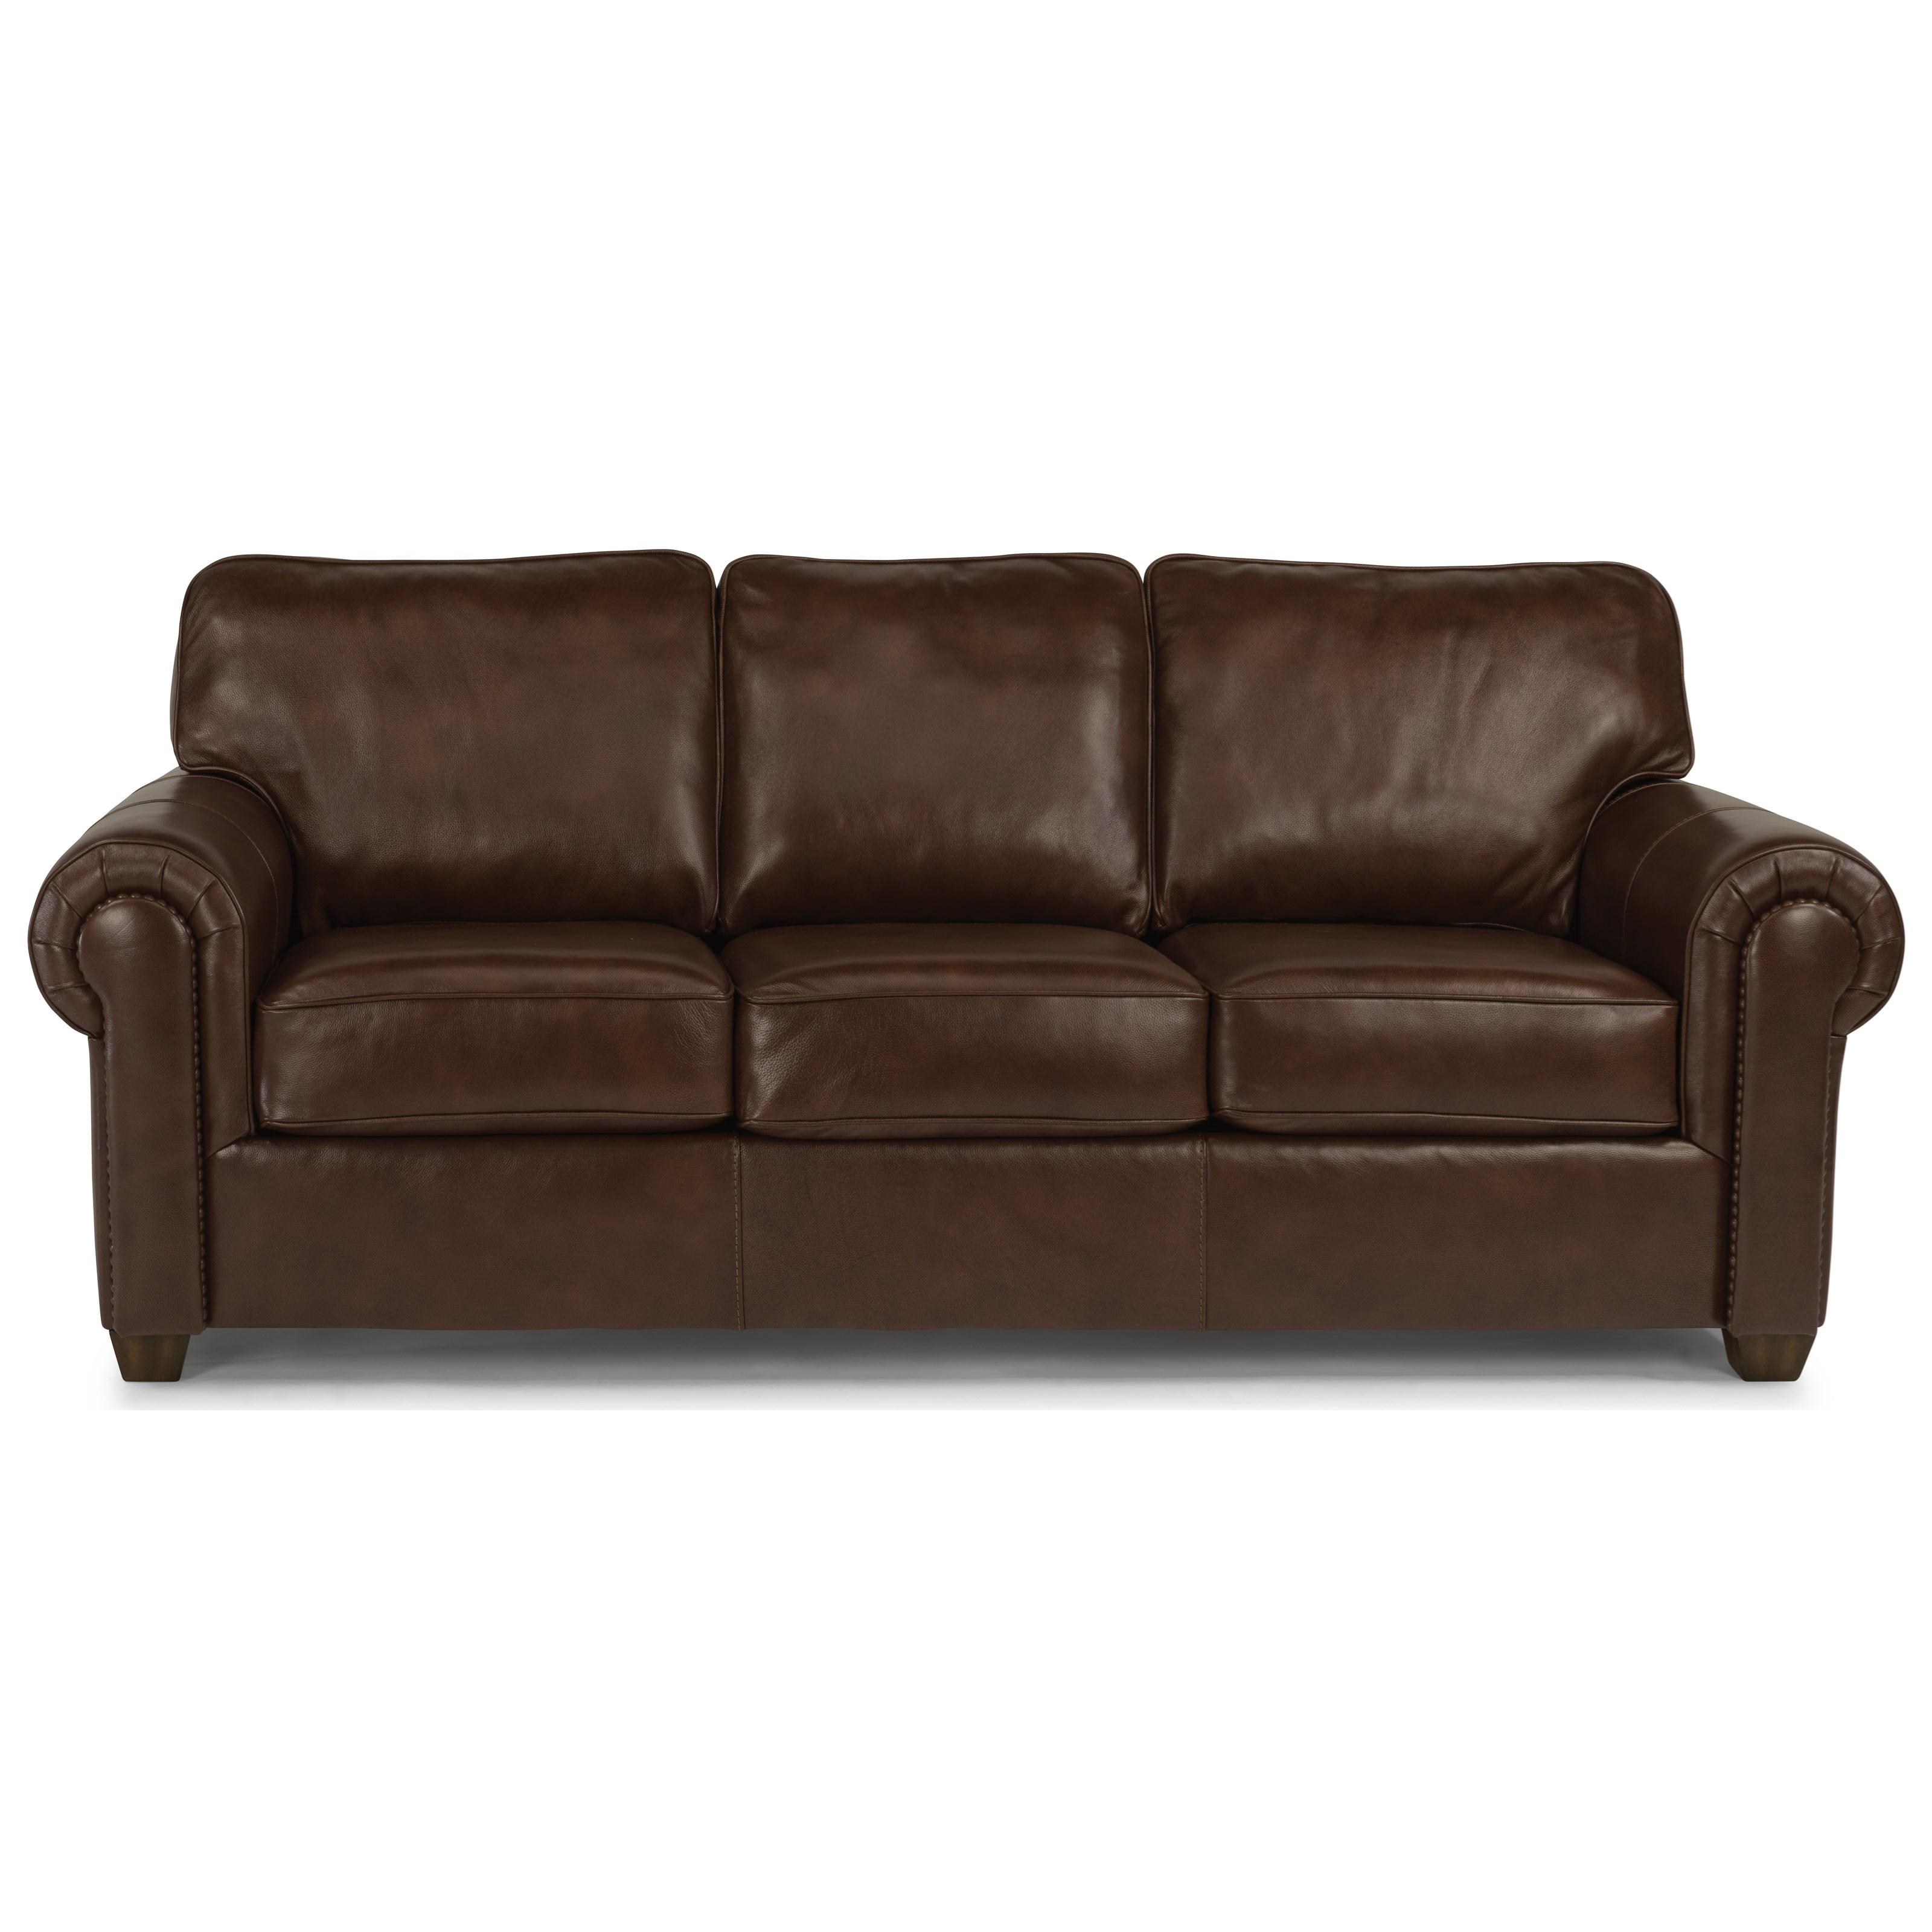 Carson Sofa  by Flexsteel at Jordan's Home Furnishings